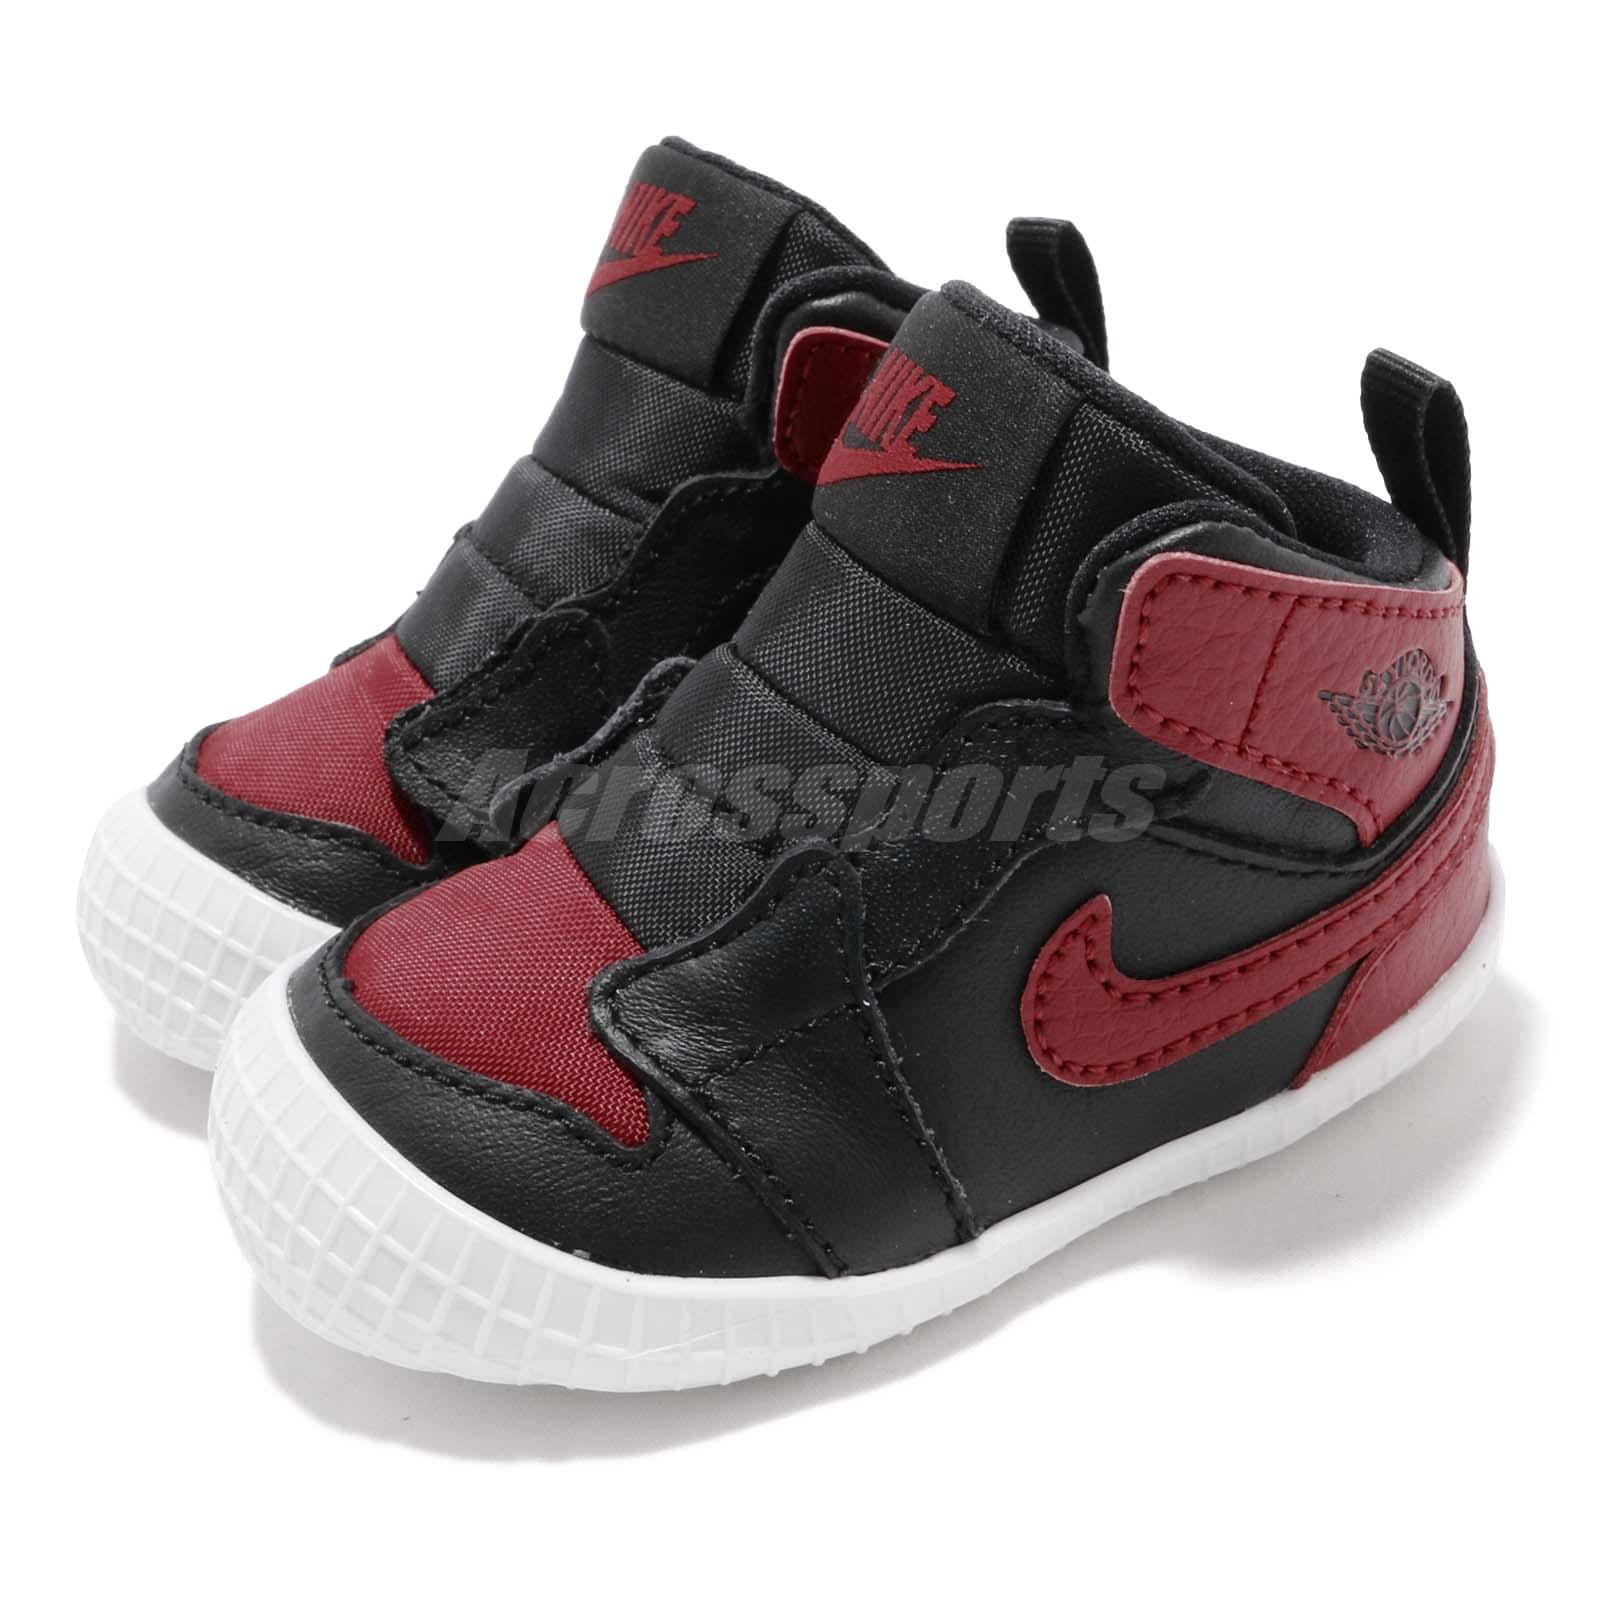 acheter populaire b1deb 758c1 Details about Nike Jordan 1 CRIB Bootie I AJ1 Bred Black Red TD Toddler  Infant Shoe AT3745-023